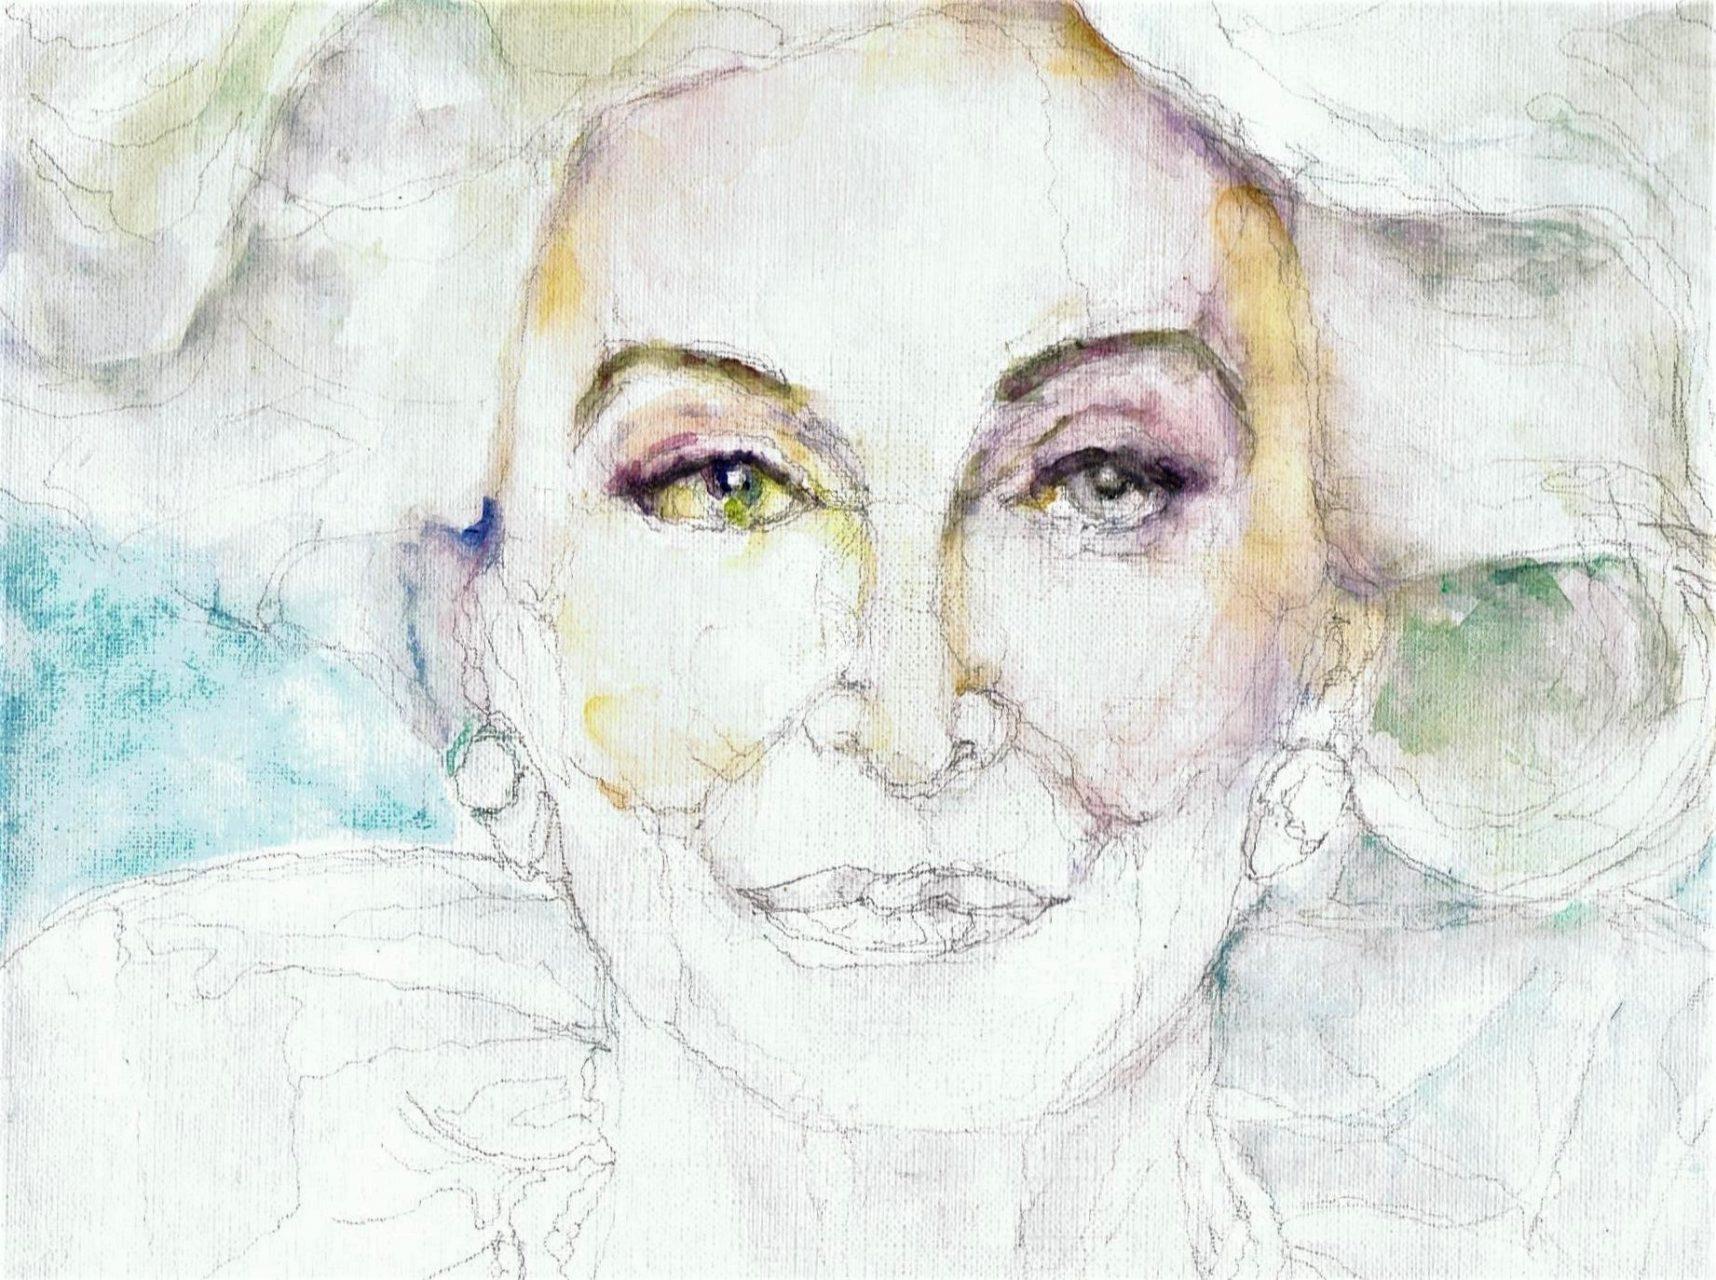 365 dagen een portret Carmen Del'Orefice, model 90 jaar oud Aquarel 19c25